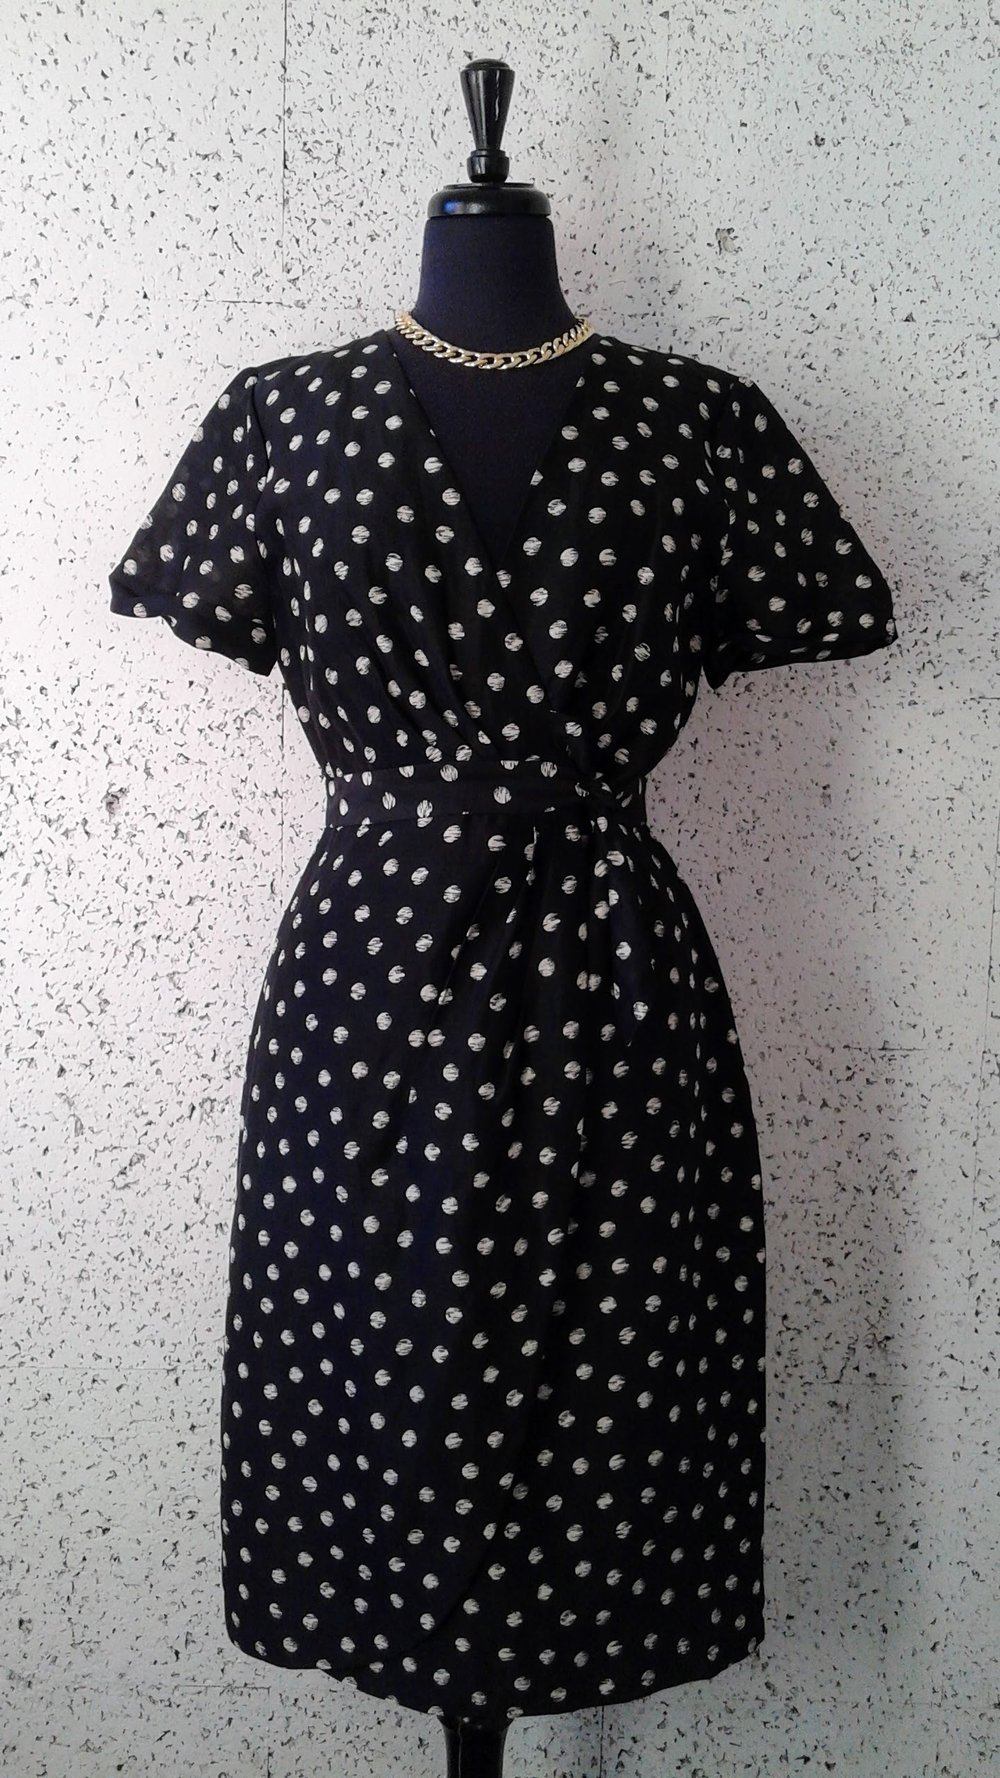 J Crew dress; Size 8, $58. Necklace $16